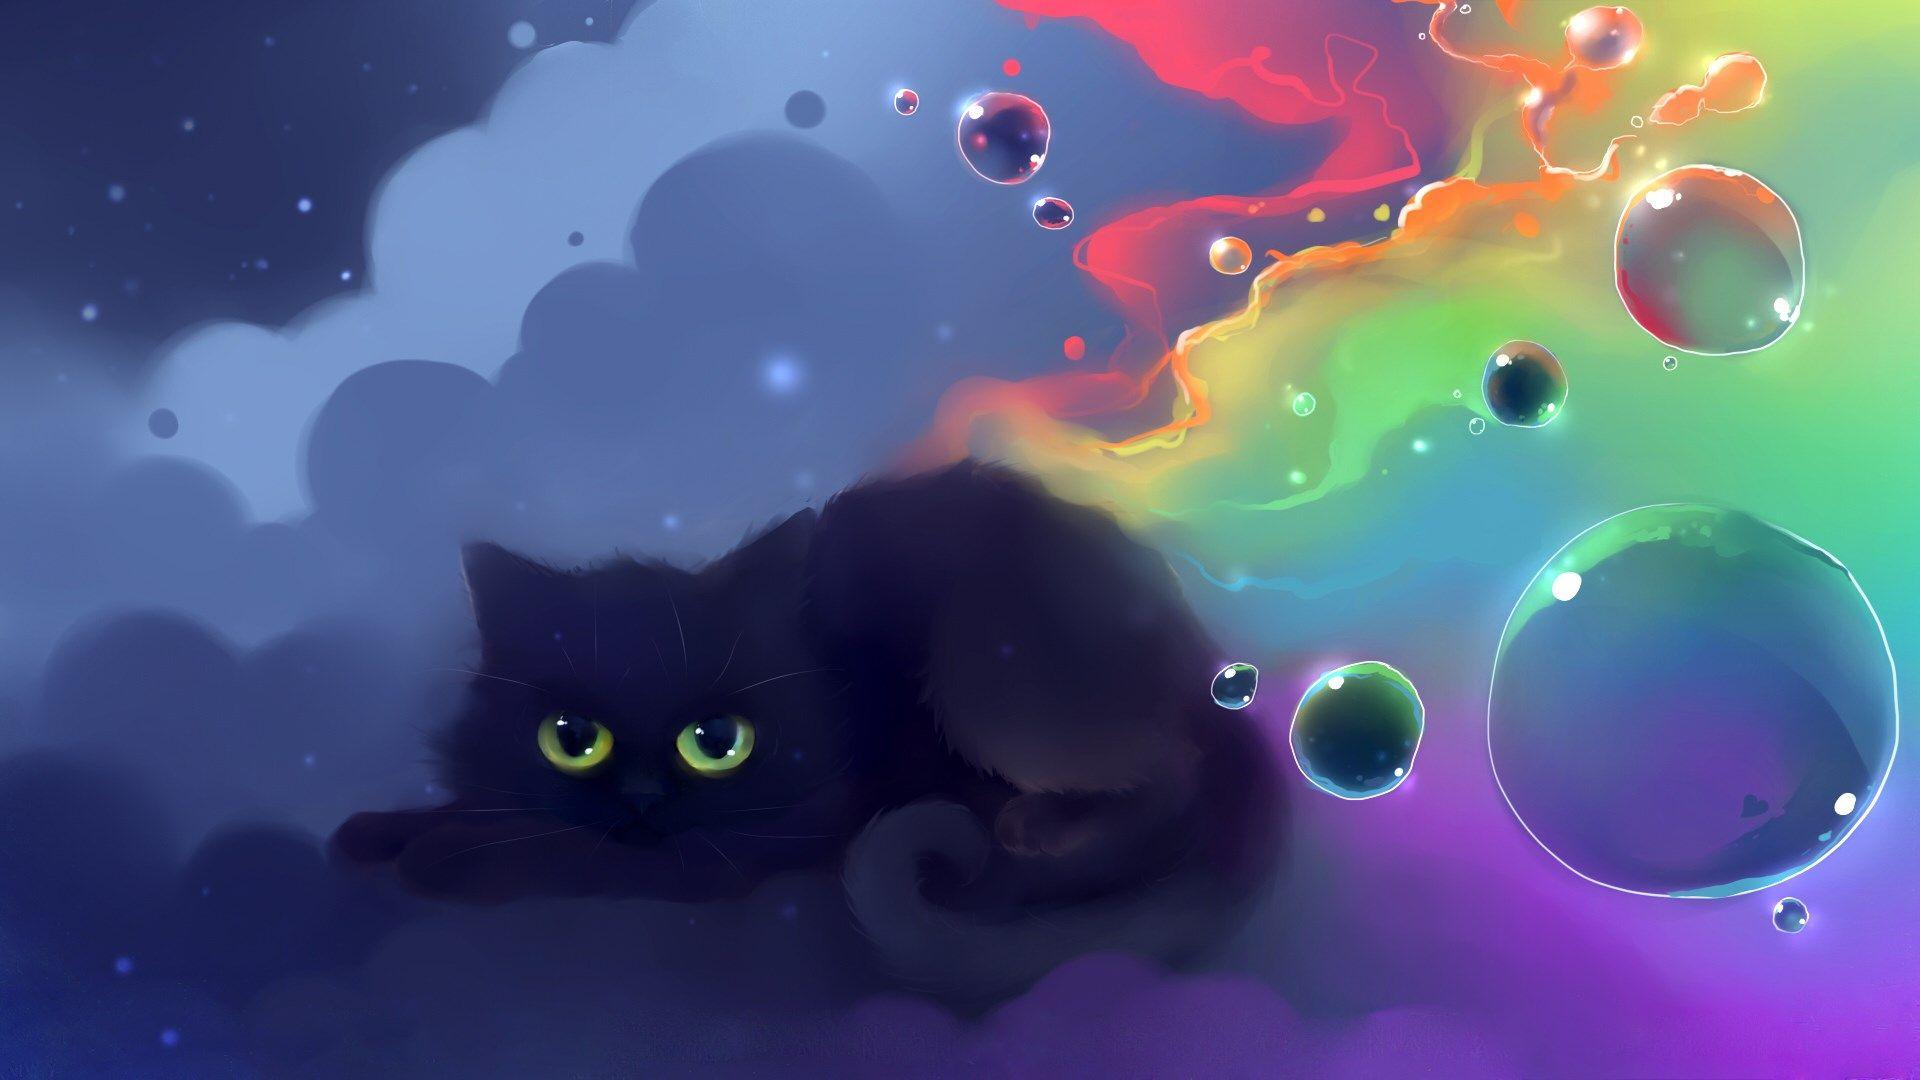 Anime Cat Wallpaper For Desktop Cat Art Anime Cat Manga Cat Cat Wallpaper